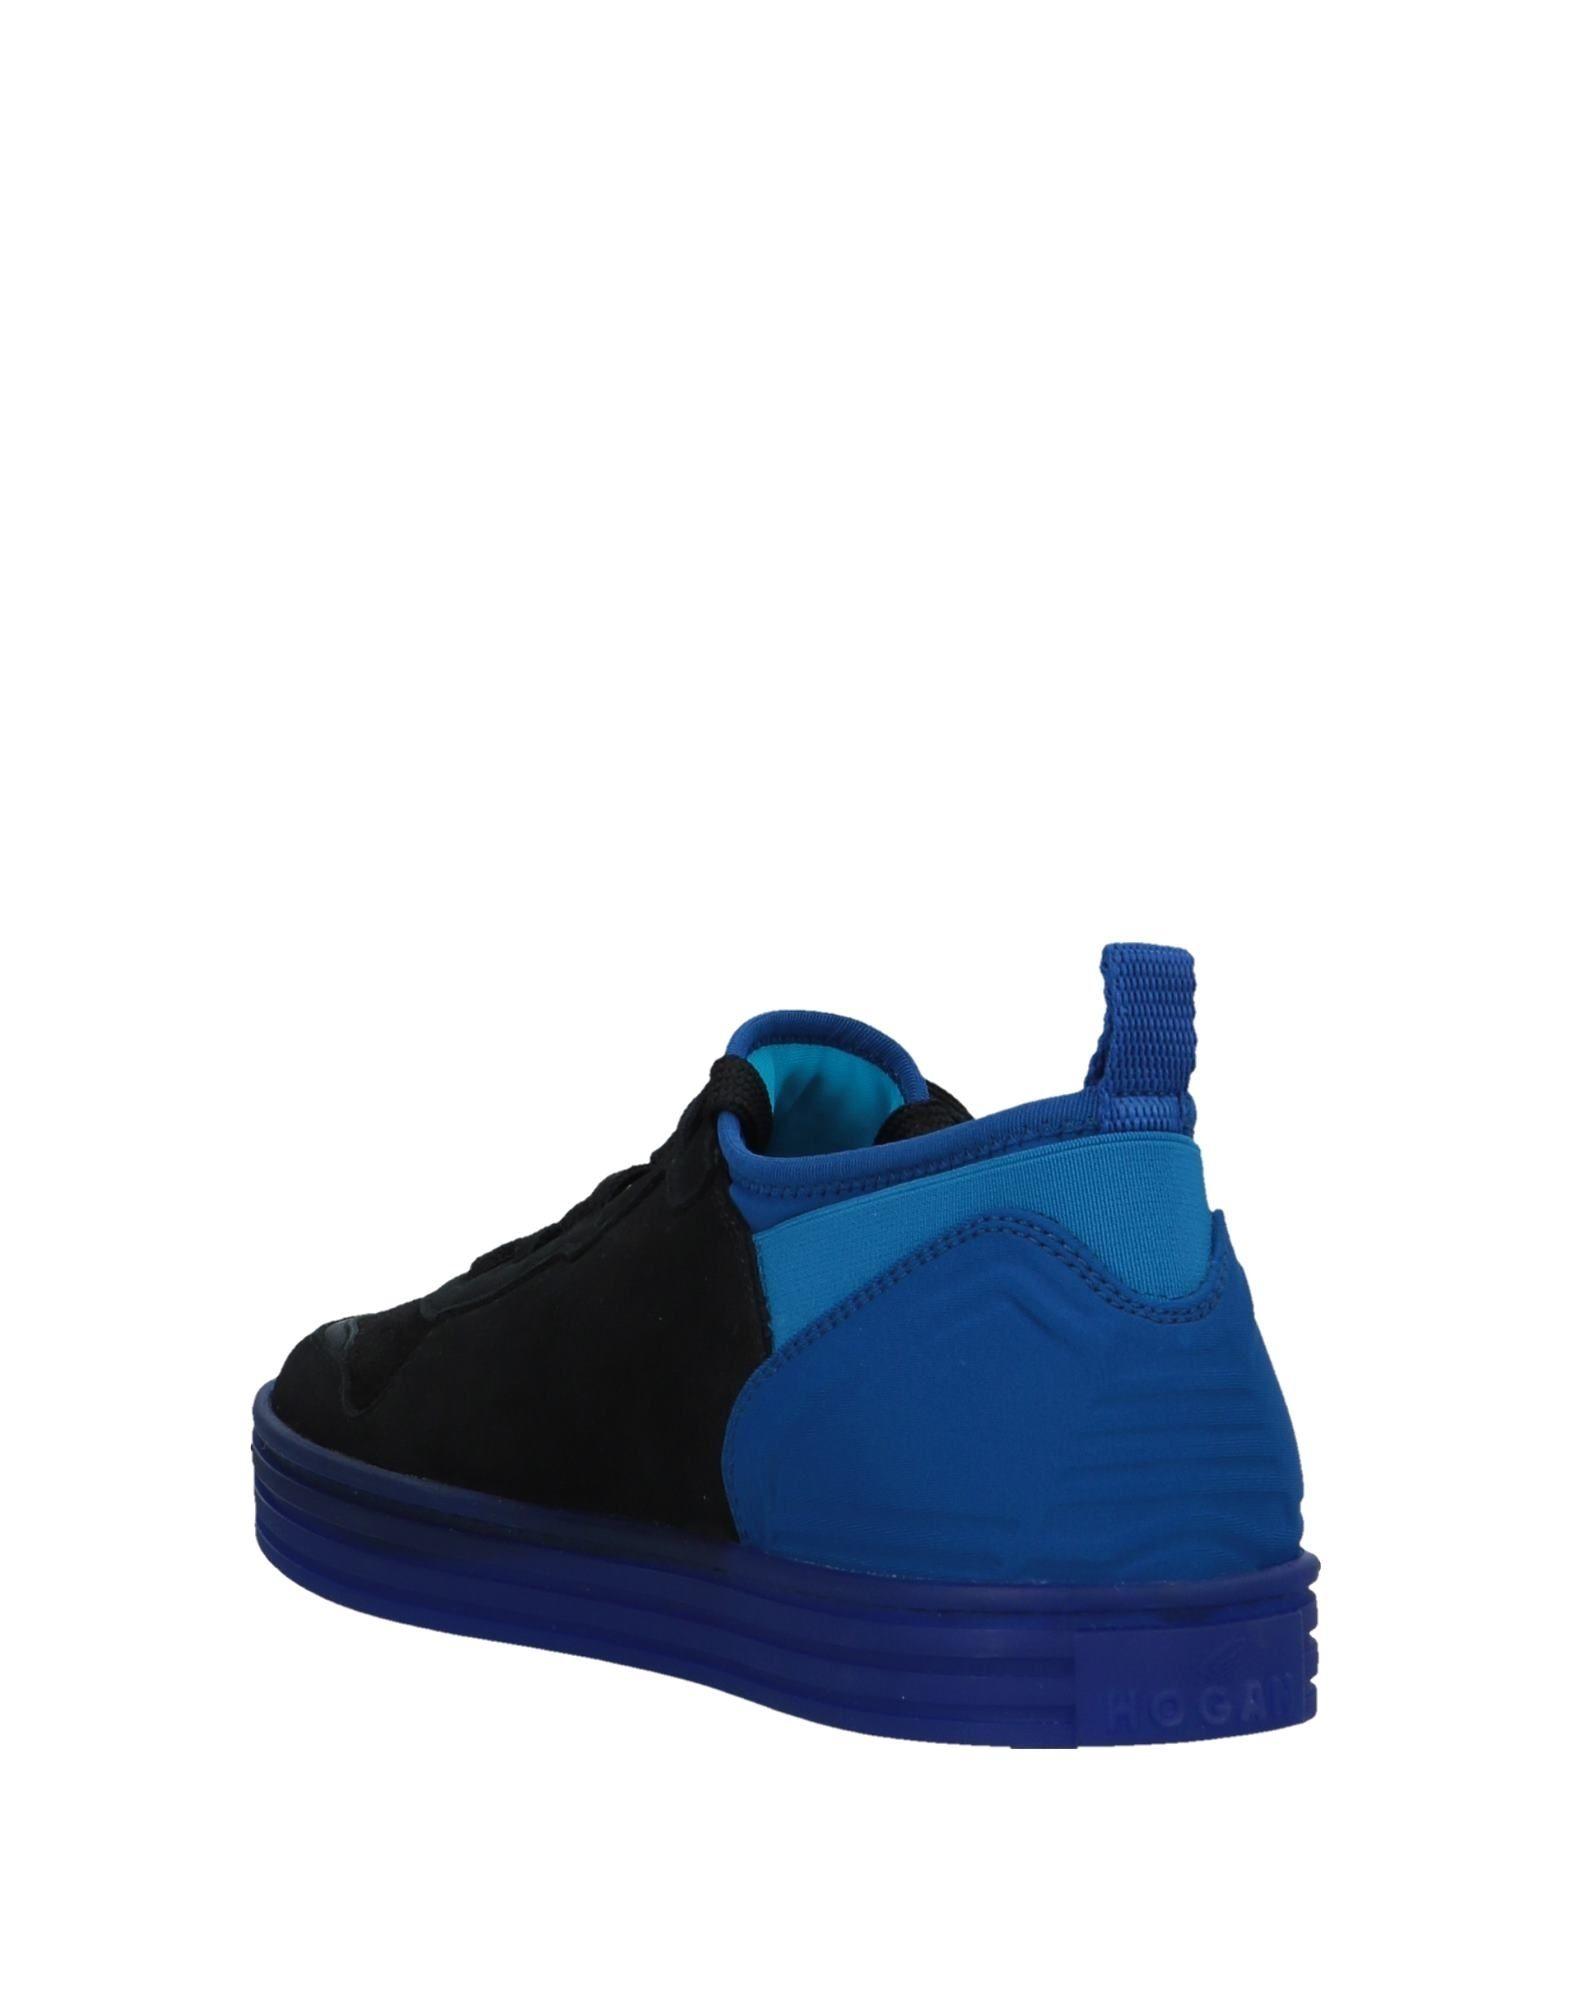 Sneakers Hogan 11541650QH Rebel Uomo - 11541650QH Hogan 348241